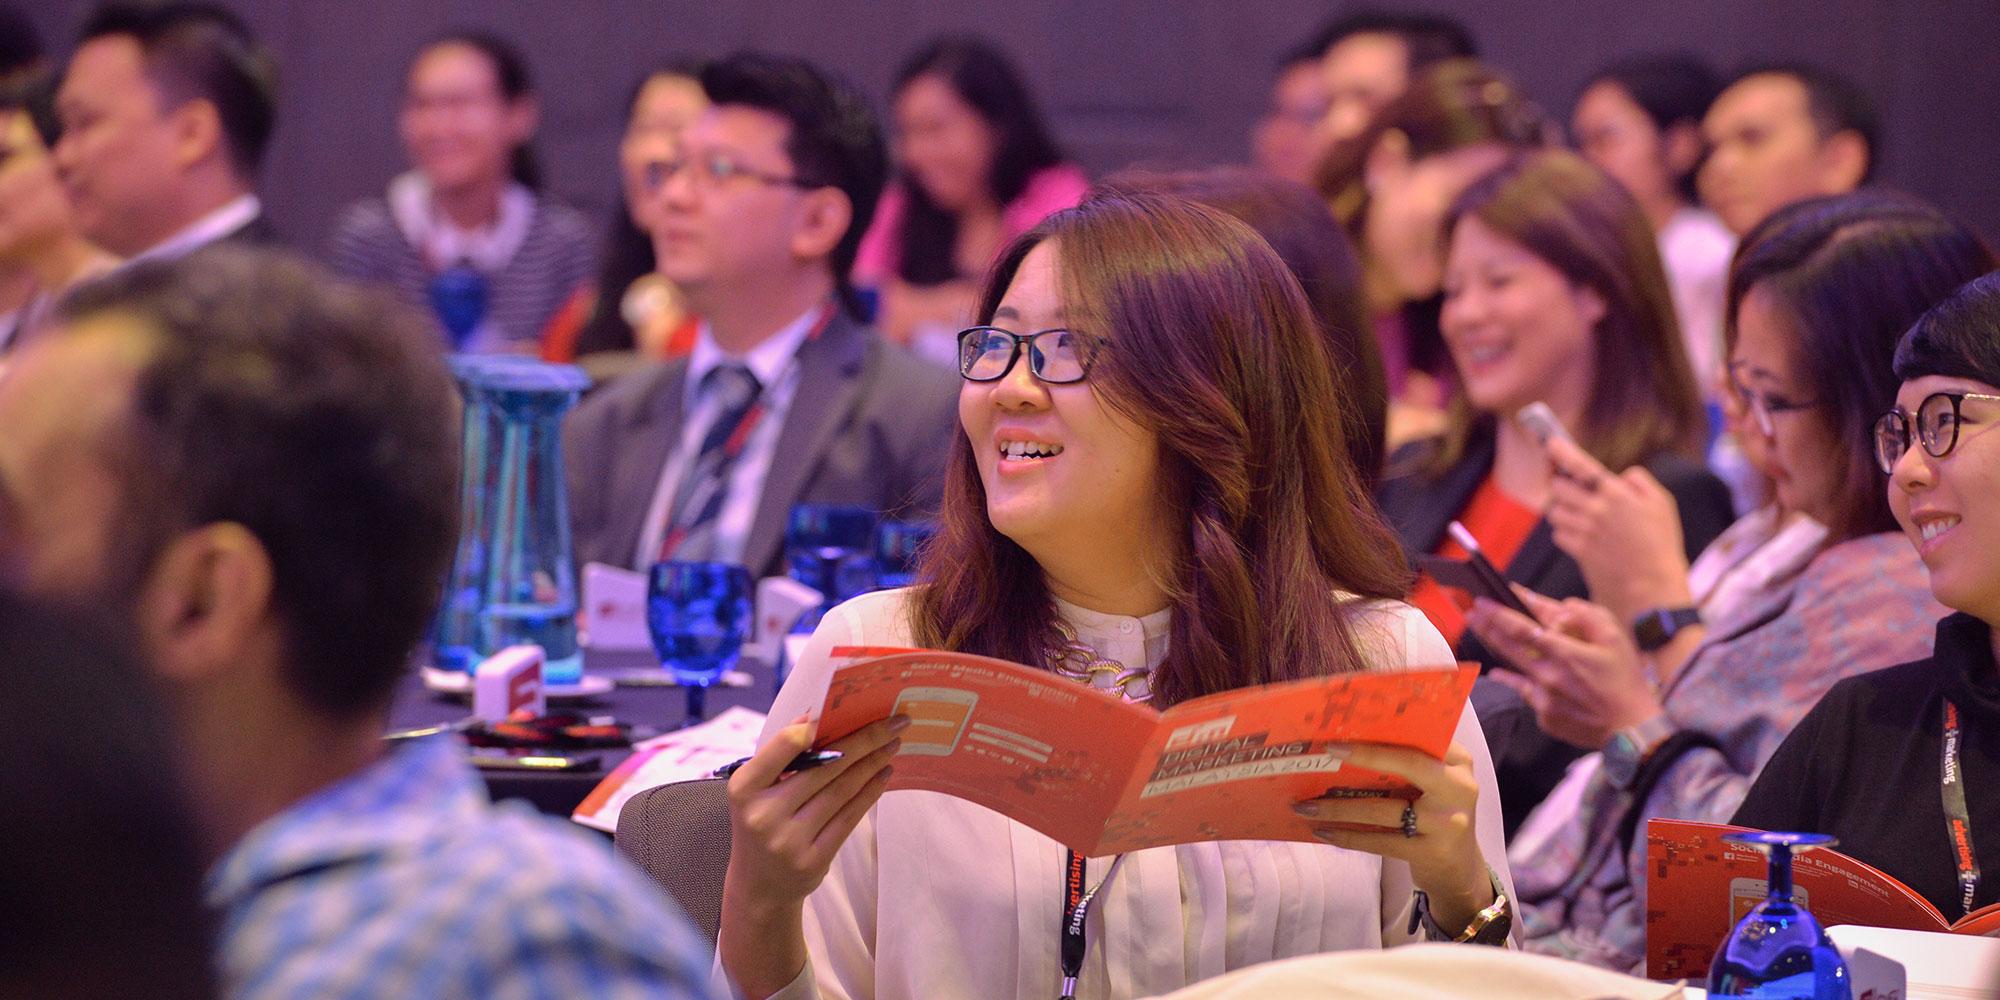 Digital Marketing Asia 2018